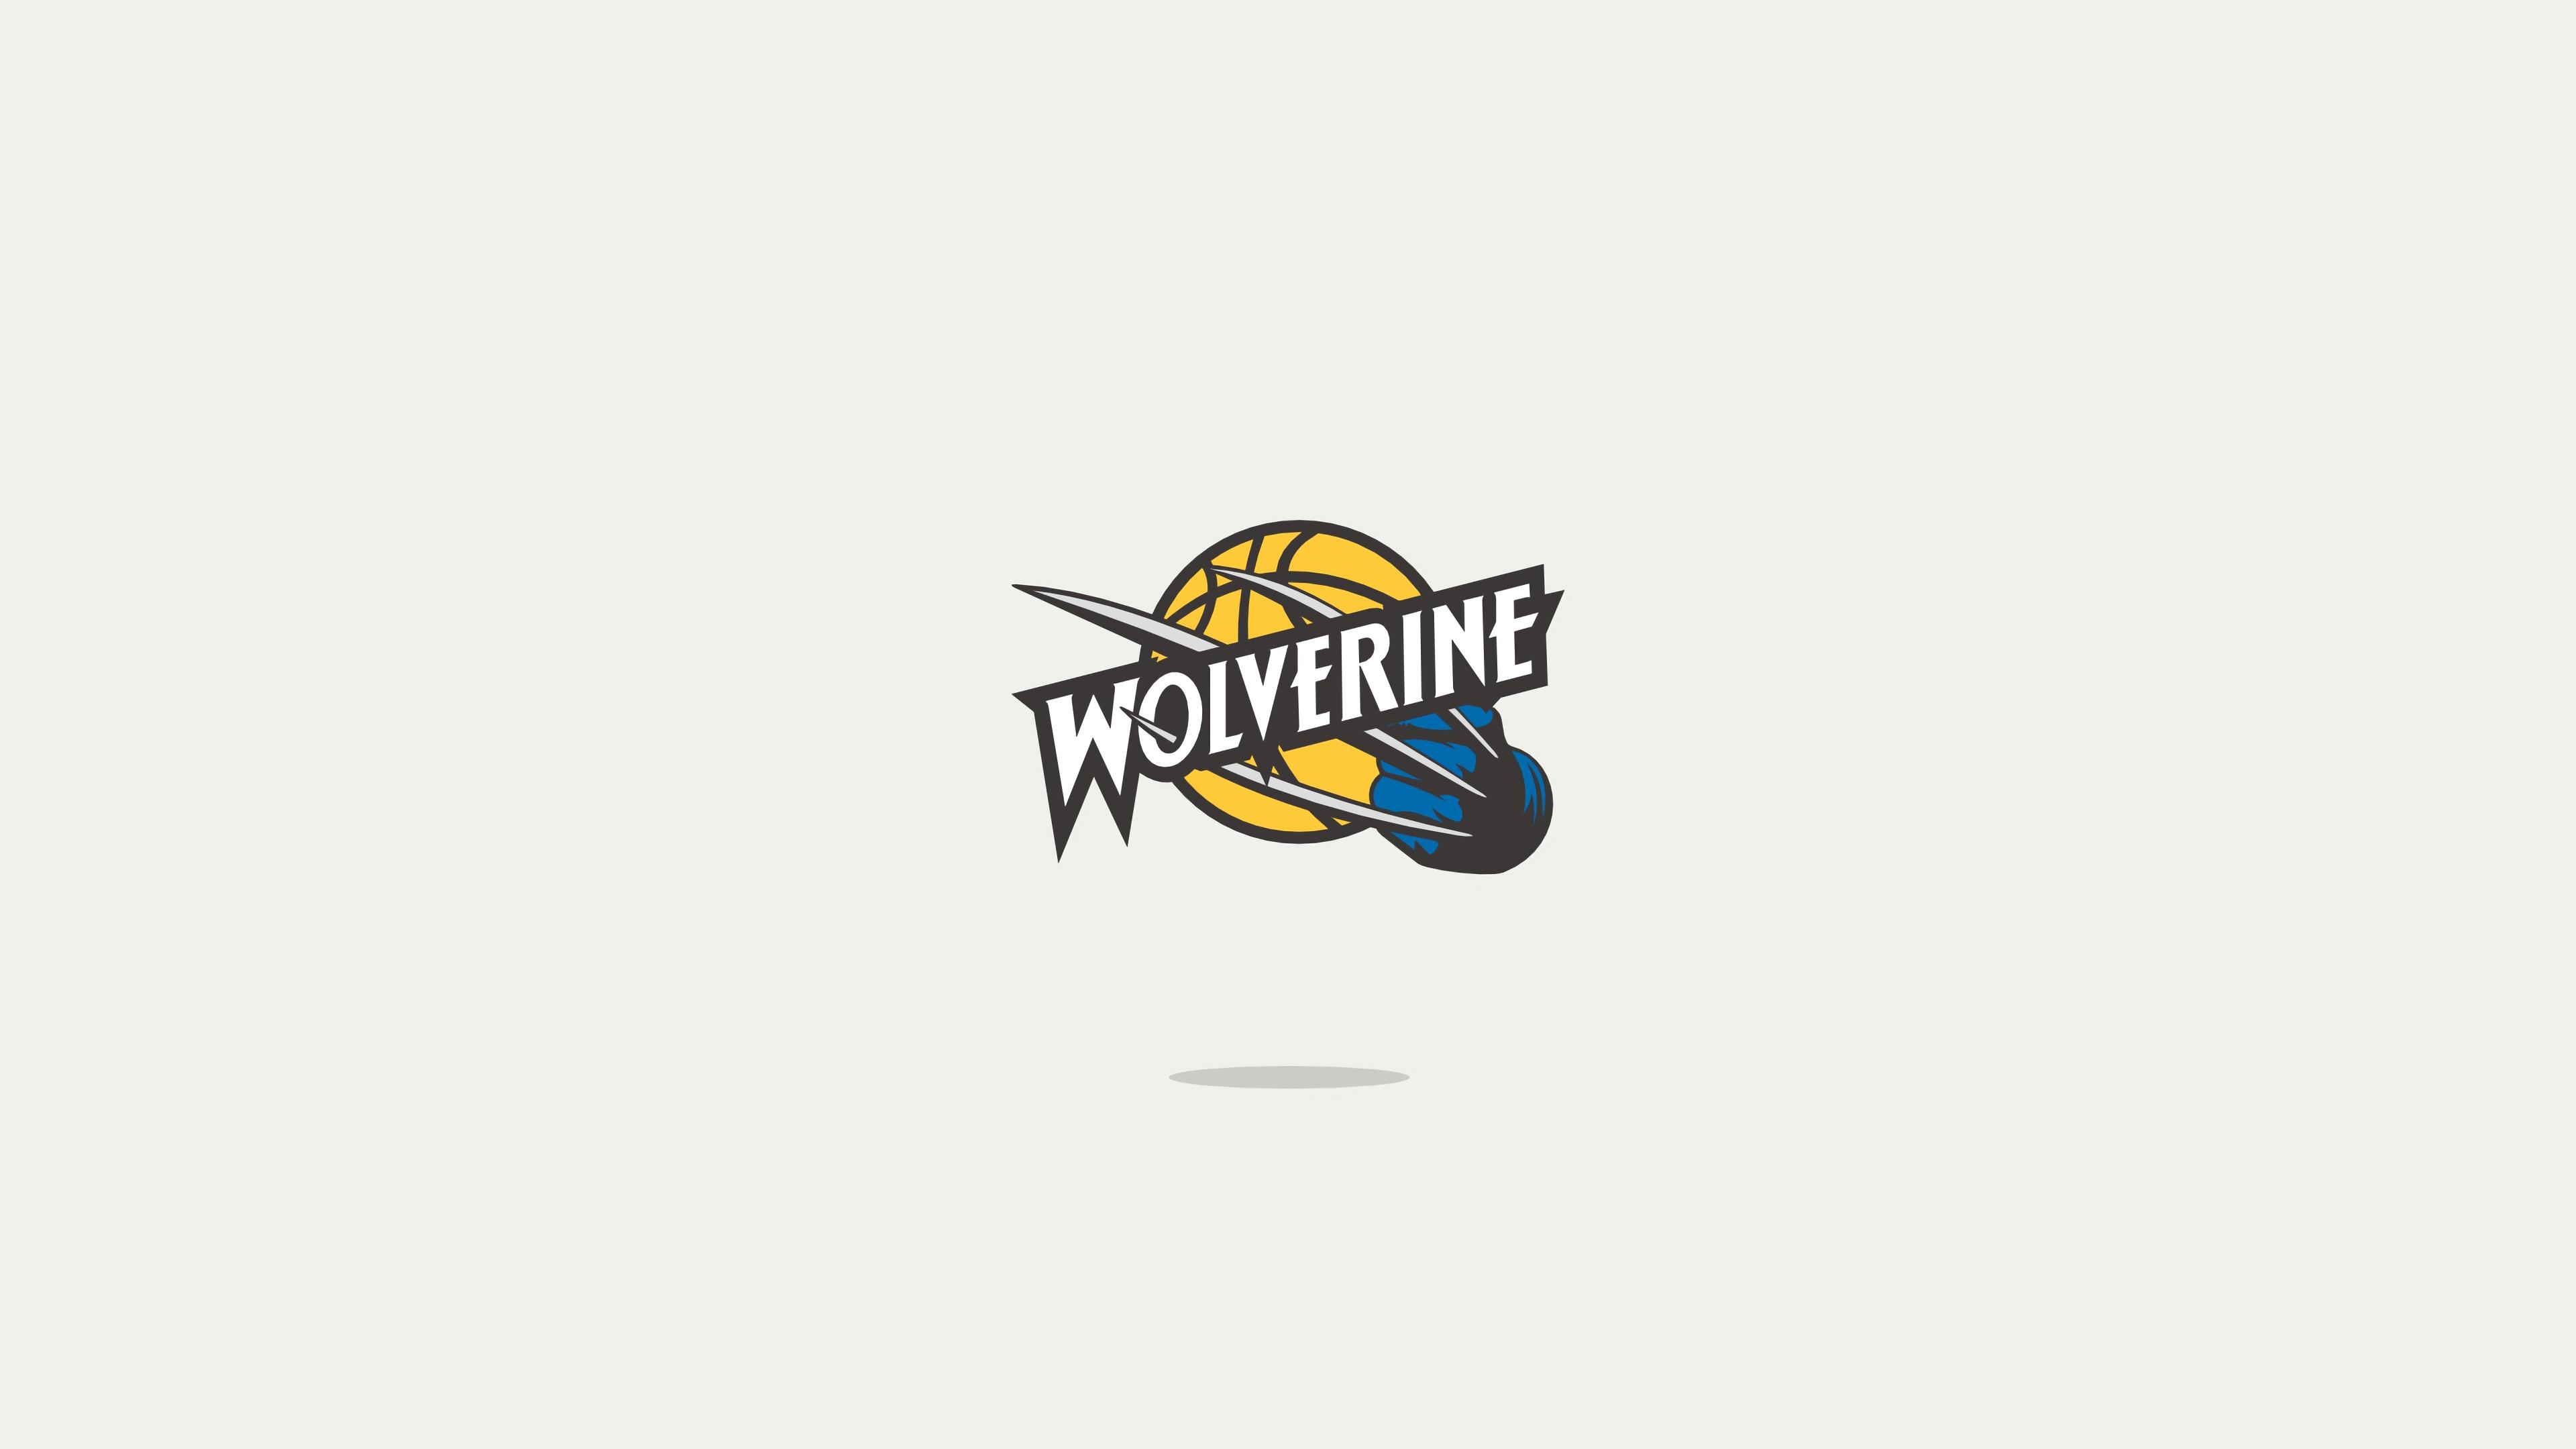 wolverine minimal logo 1568055216 - Wolverine Minimal Logo - wolverine wallpapers, superheroes wallpapers, minimalist wallpapers, minimalism wallpapers, hd-wallpapers, behance wallpapers, 4k-wallpapers